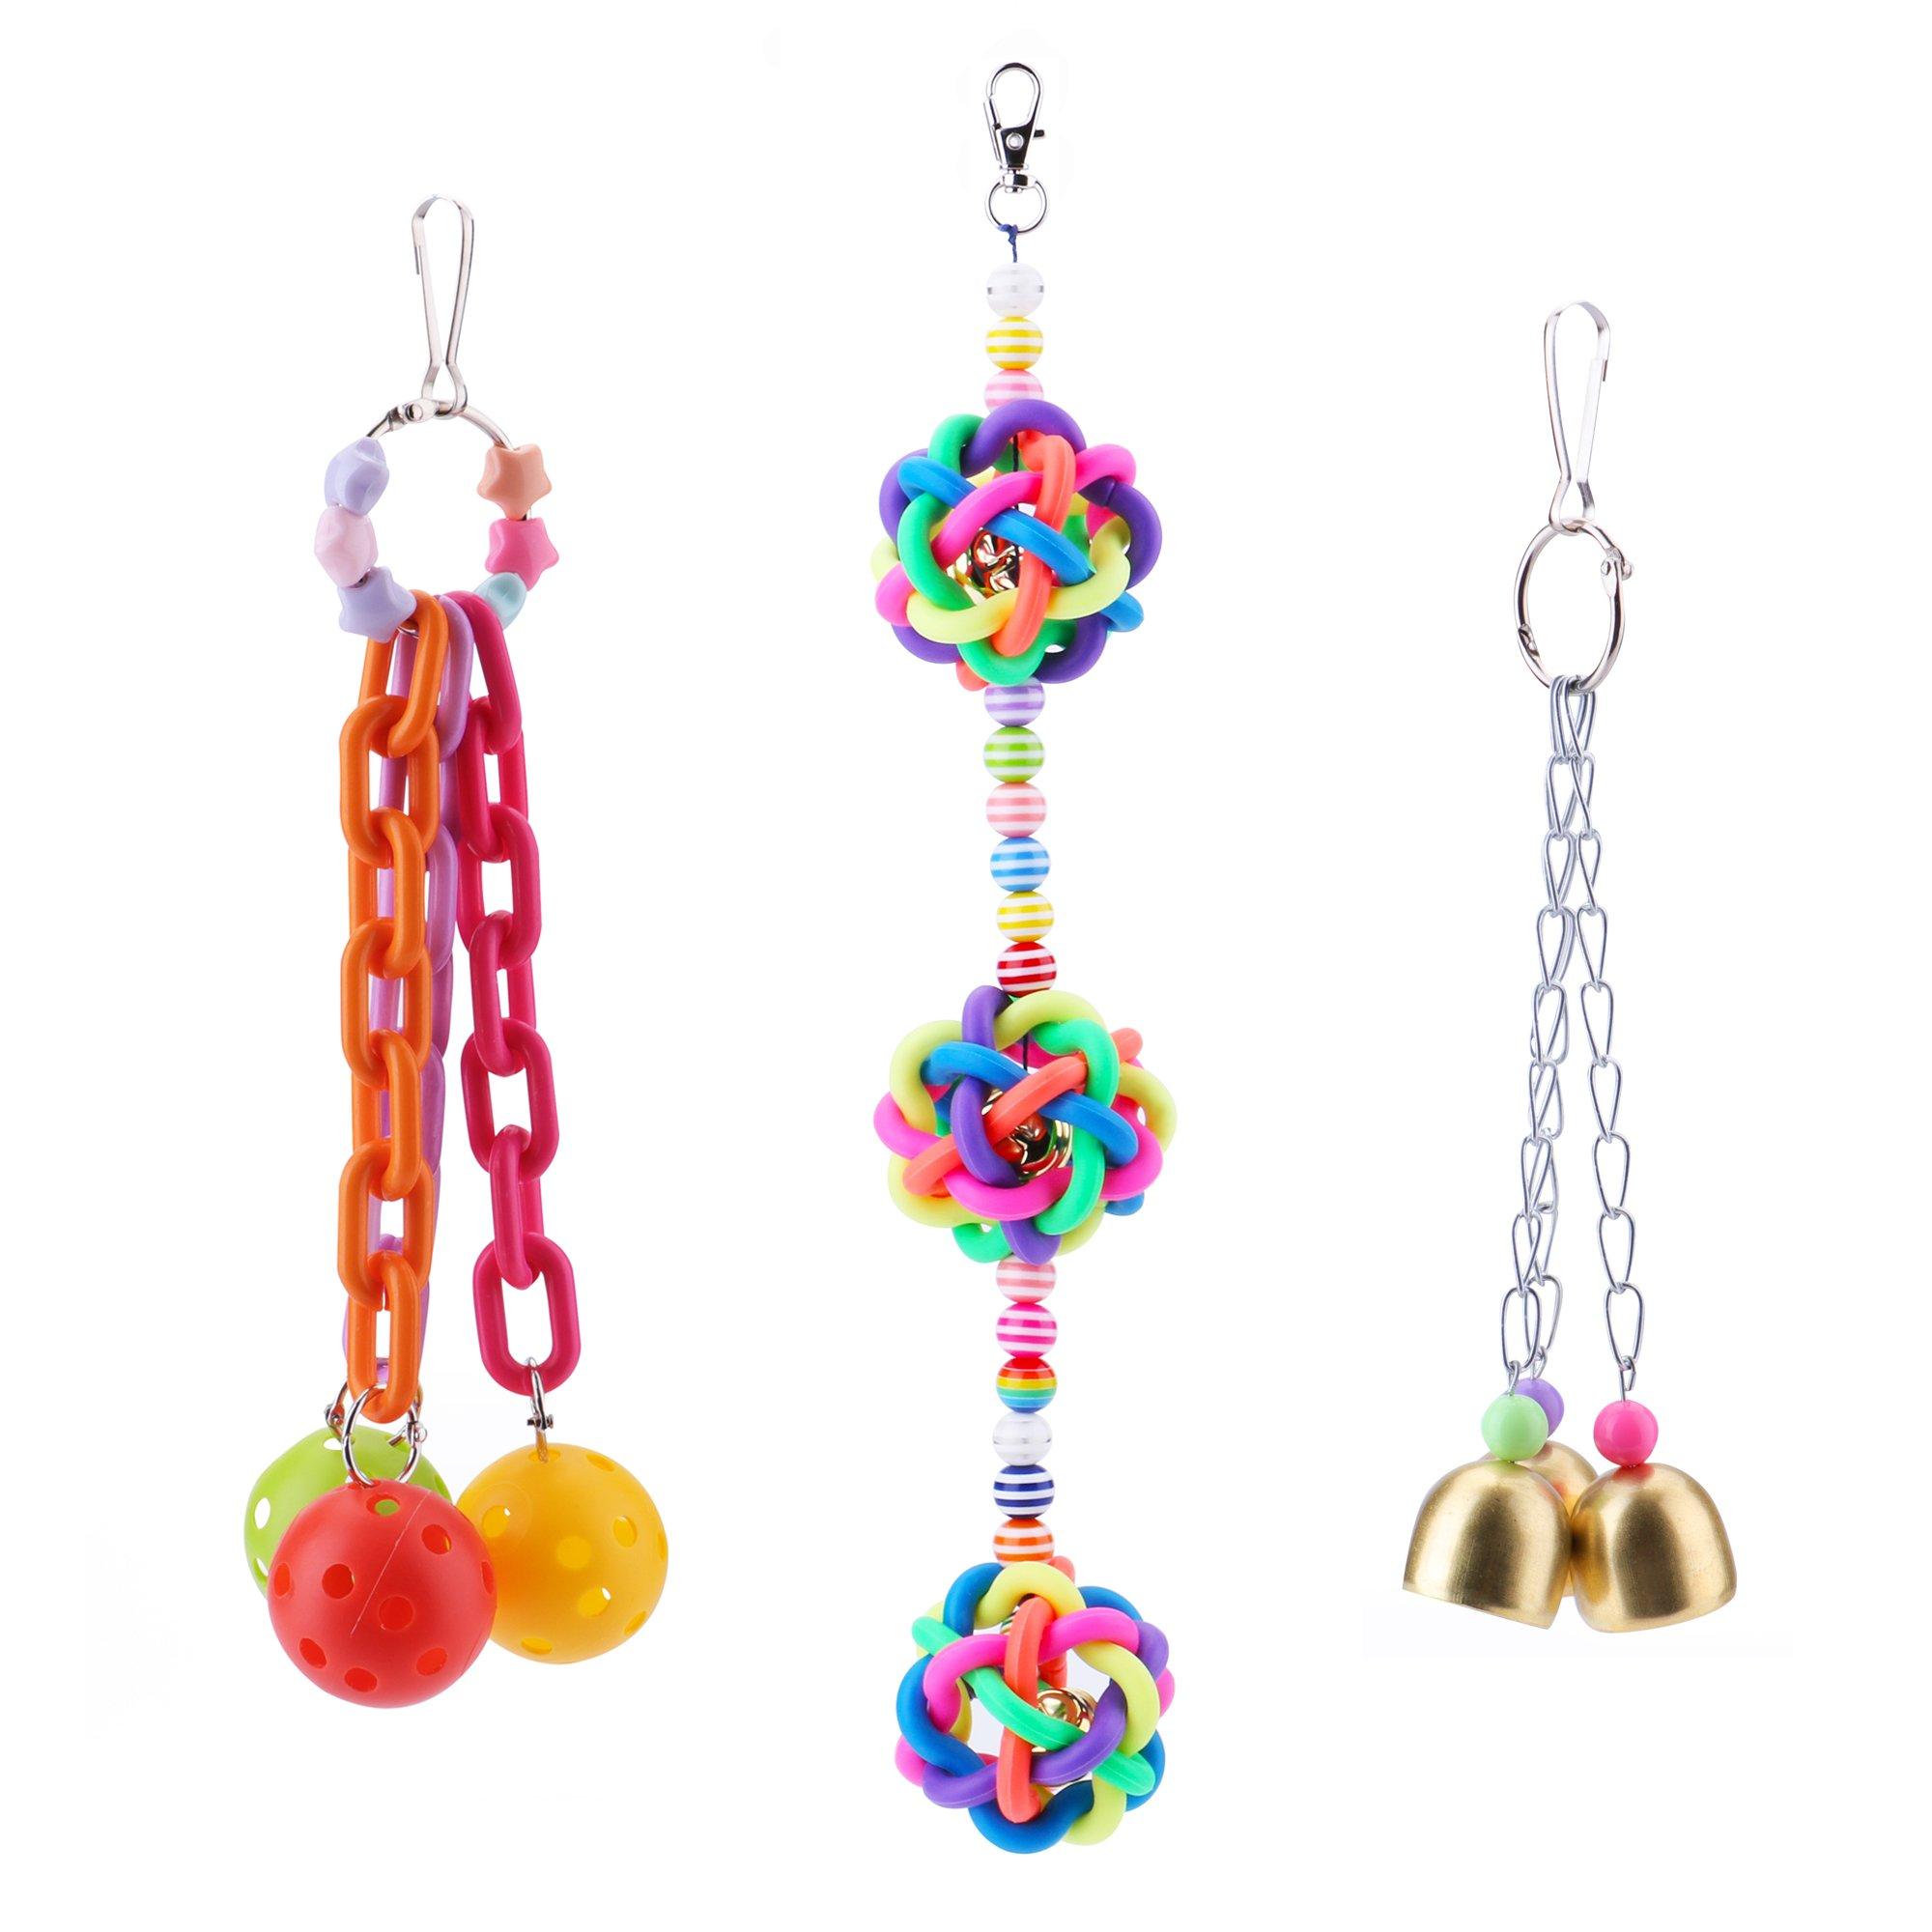 Wandergo Colorful Bird Toys Bells Small Medium Parrot (3 Pack)